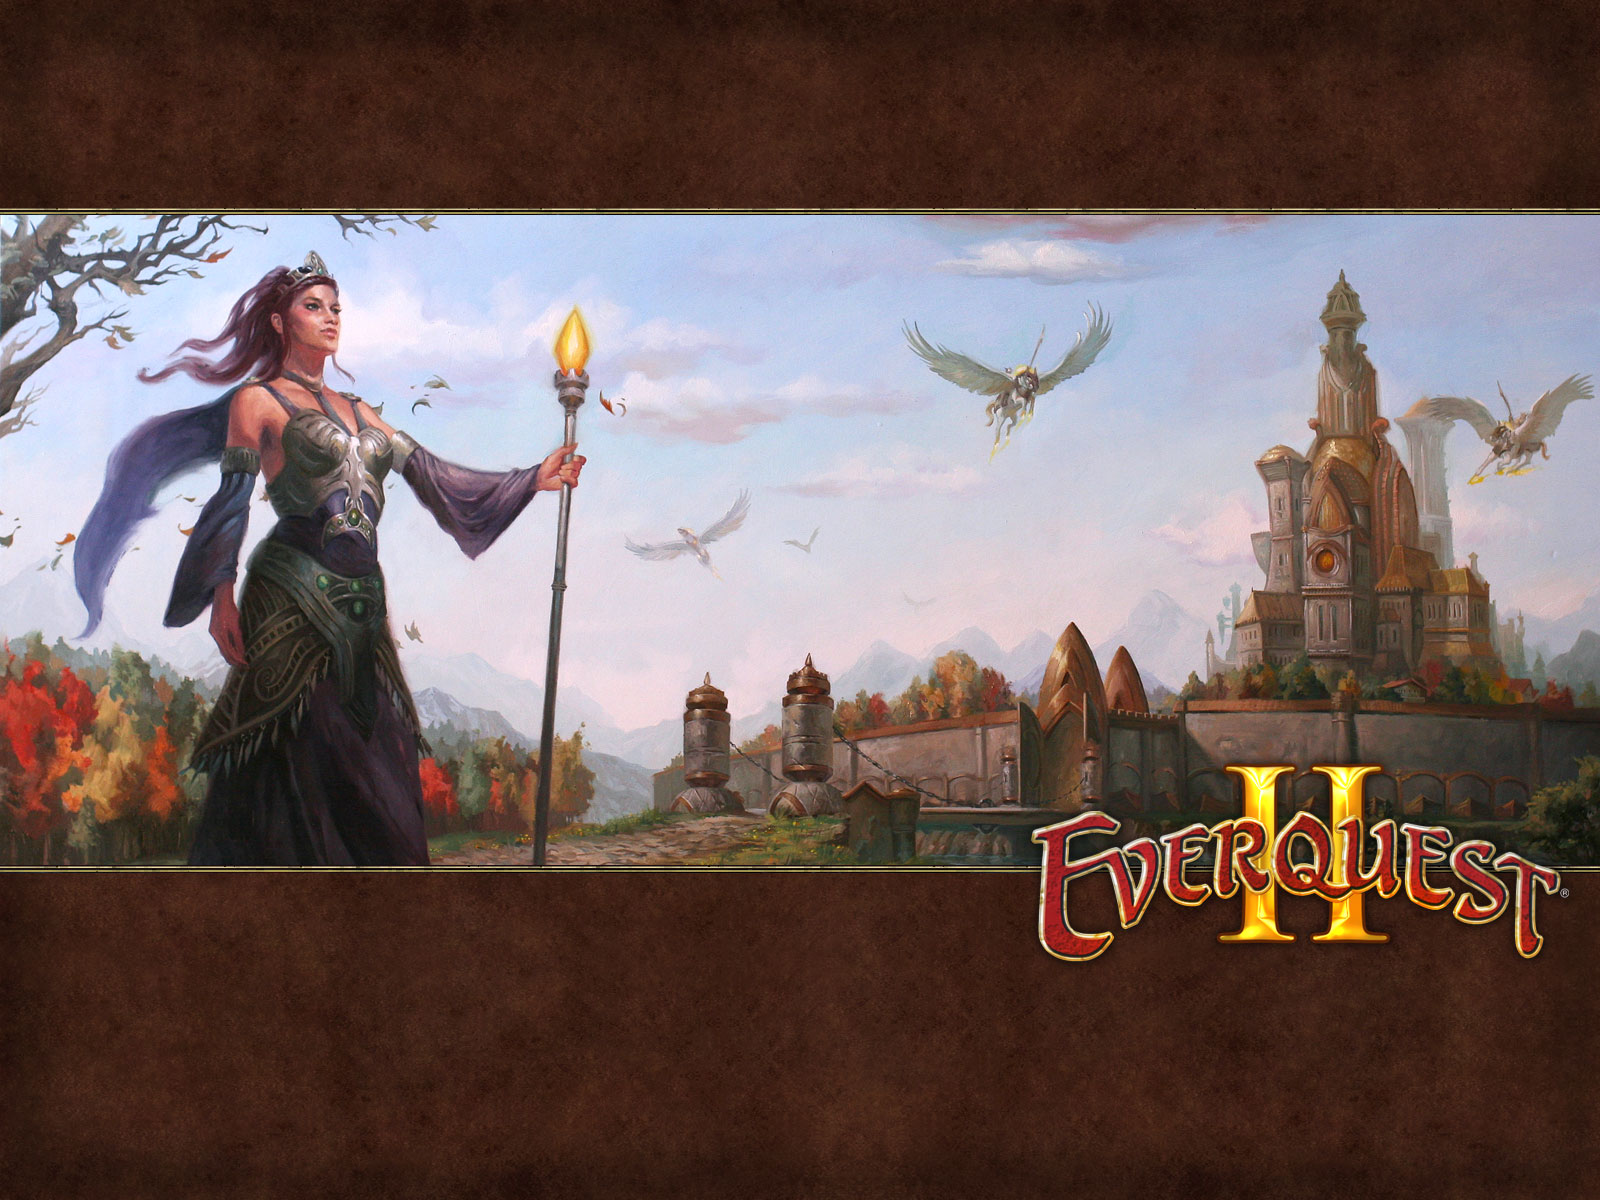 50] Everquest 2 Wallpaper on WallpaperSafari 1600x1200